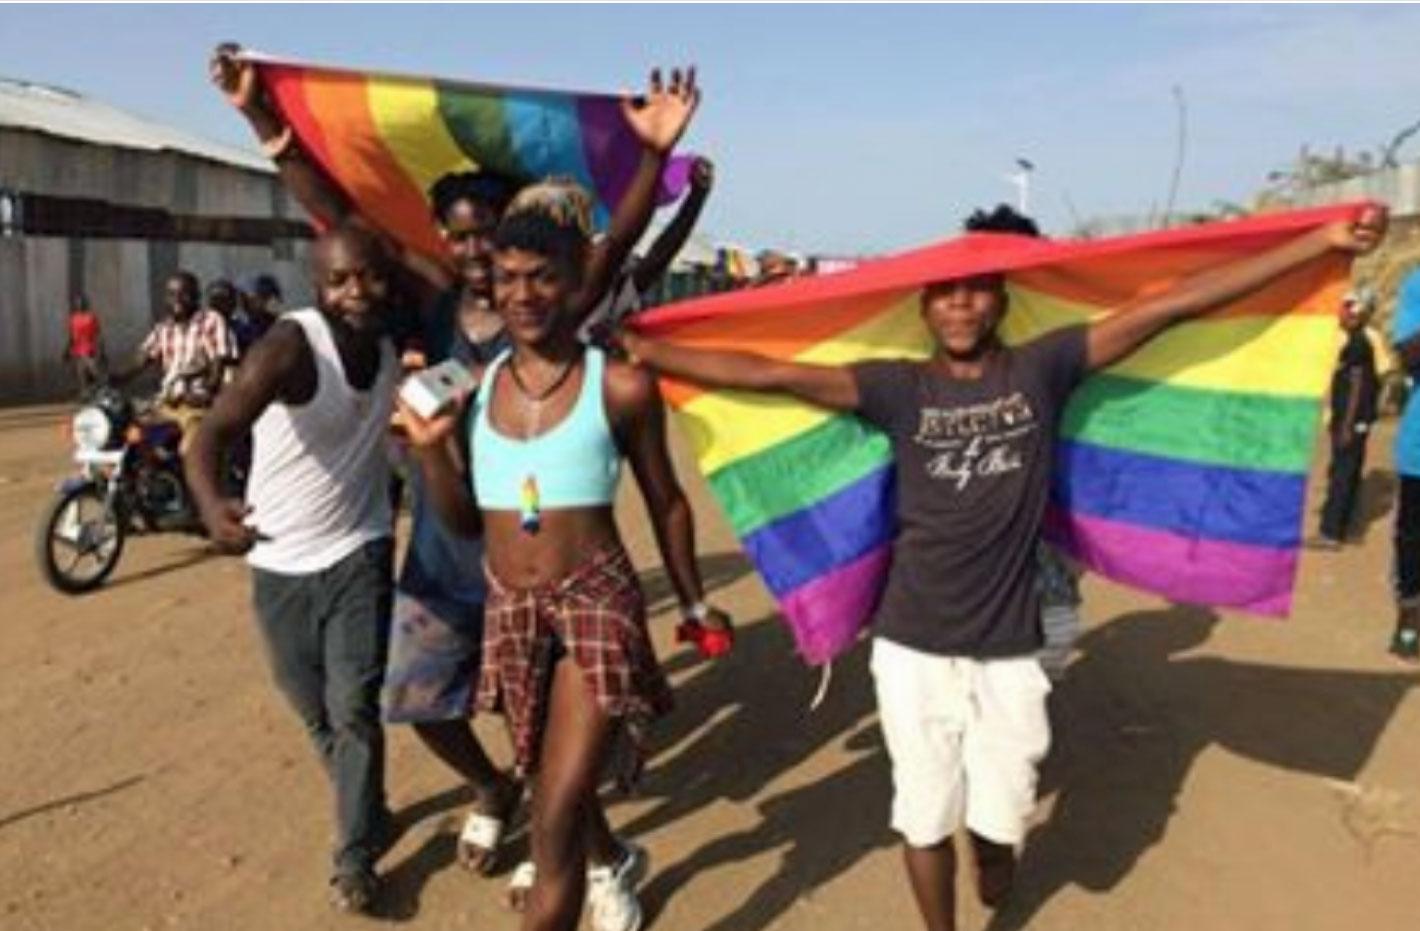 Scene from Pride at Kakuma refugee camp in Kenya. (Photo courtesy of Rainbow Flag Kakuma)